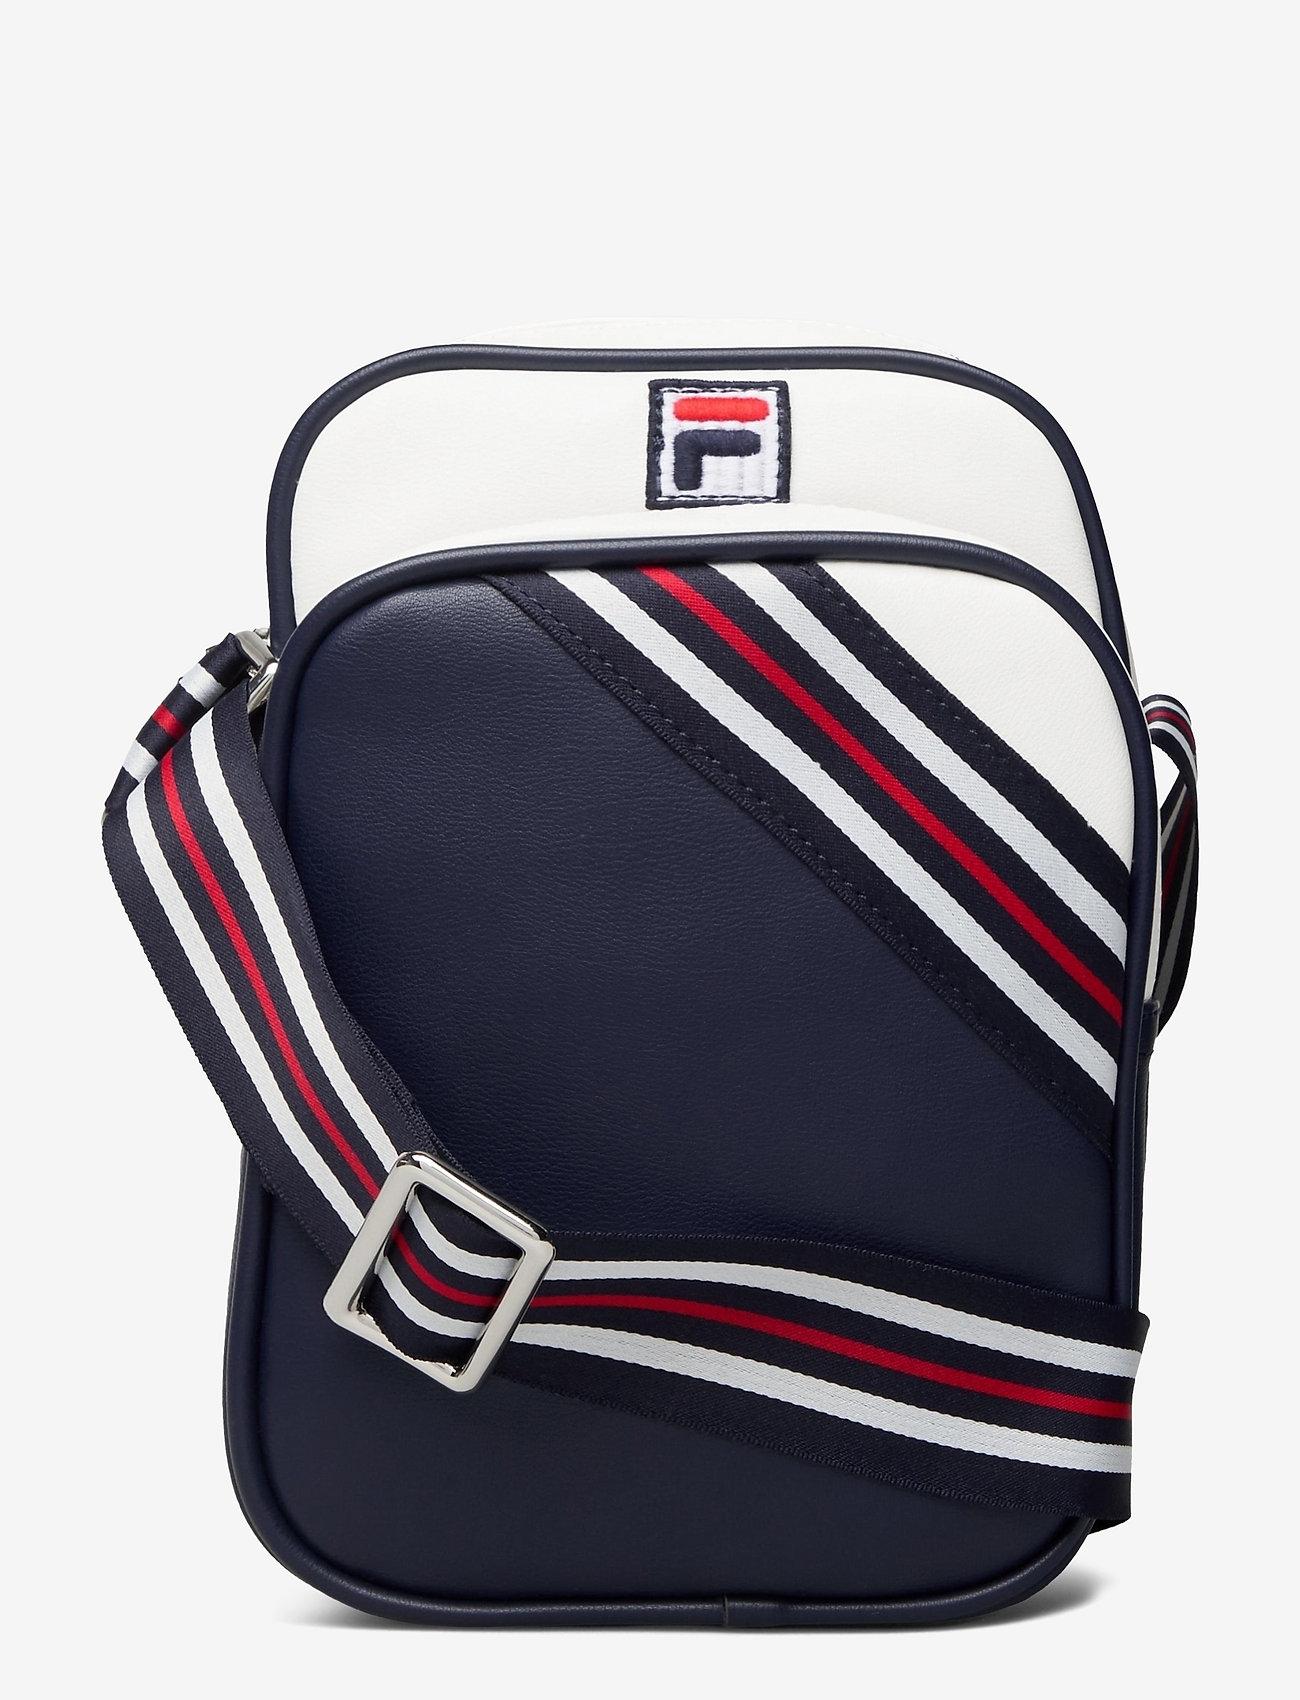 FILA - HERITAGE PUSHER BAG - sacs à bandoulière - black iris-bright white-true red - 0